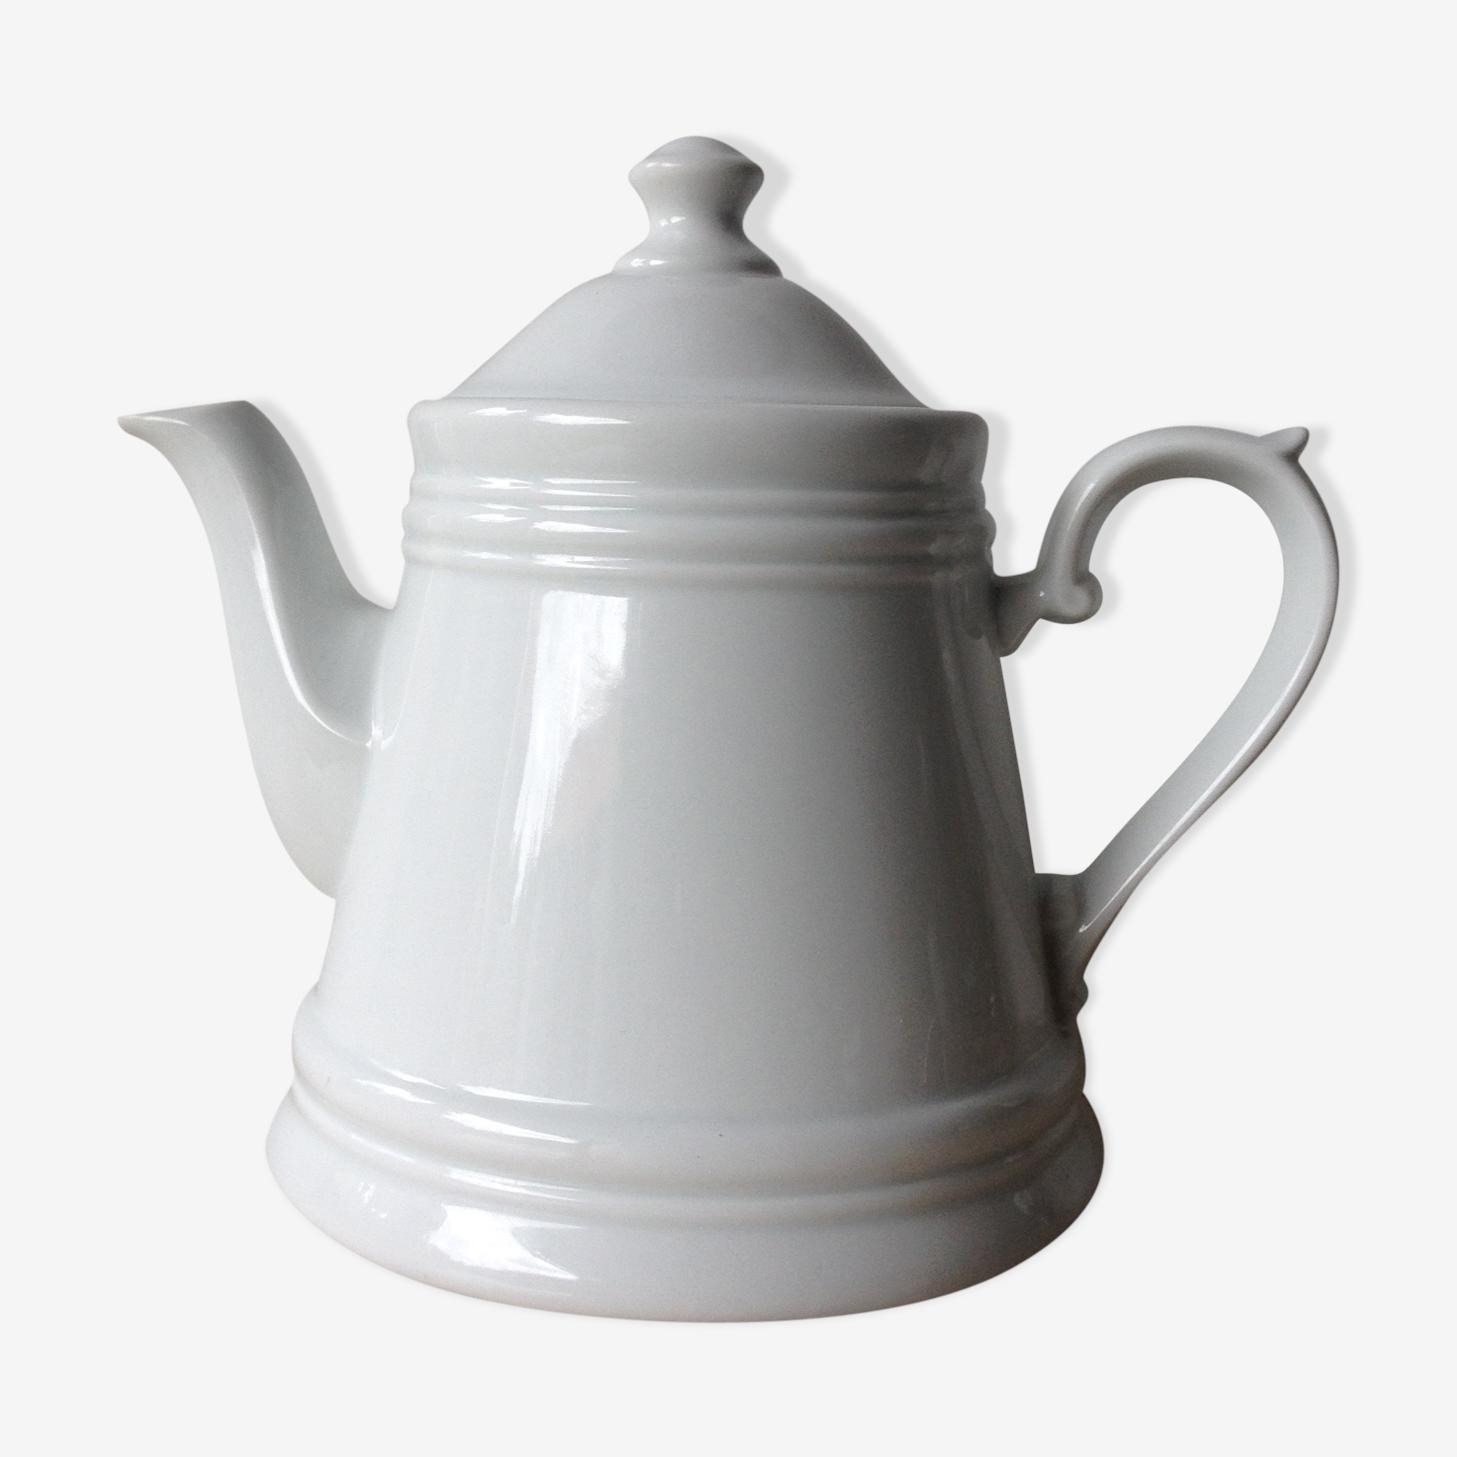 Teapot white earthenware -West Germany